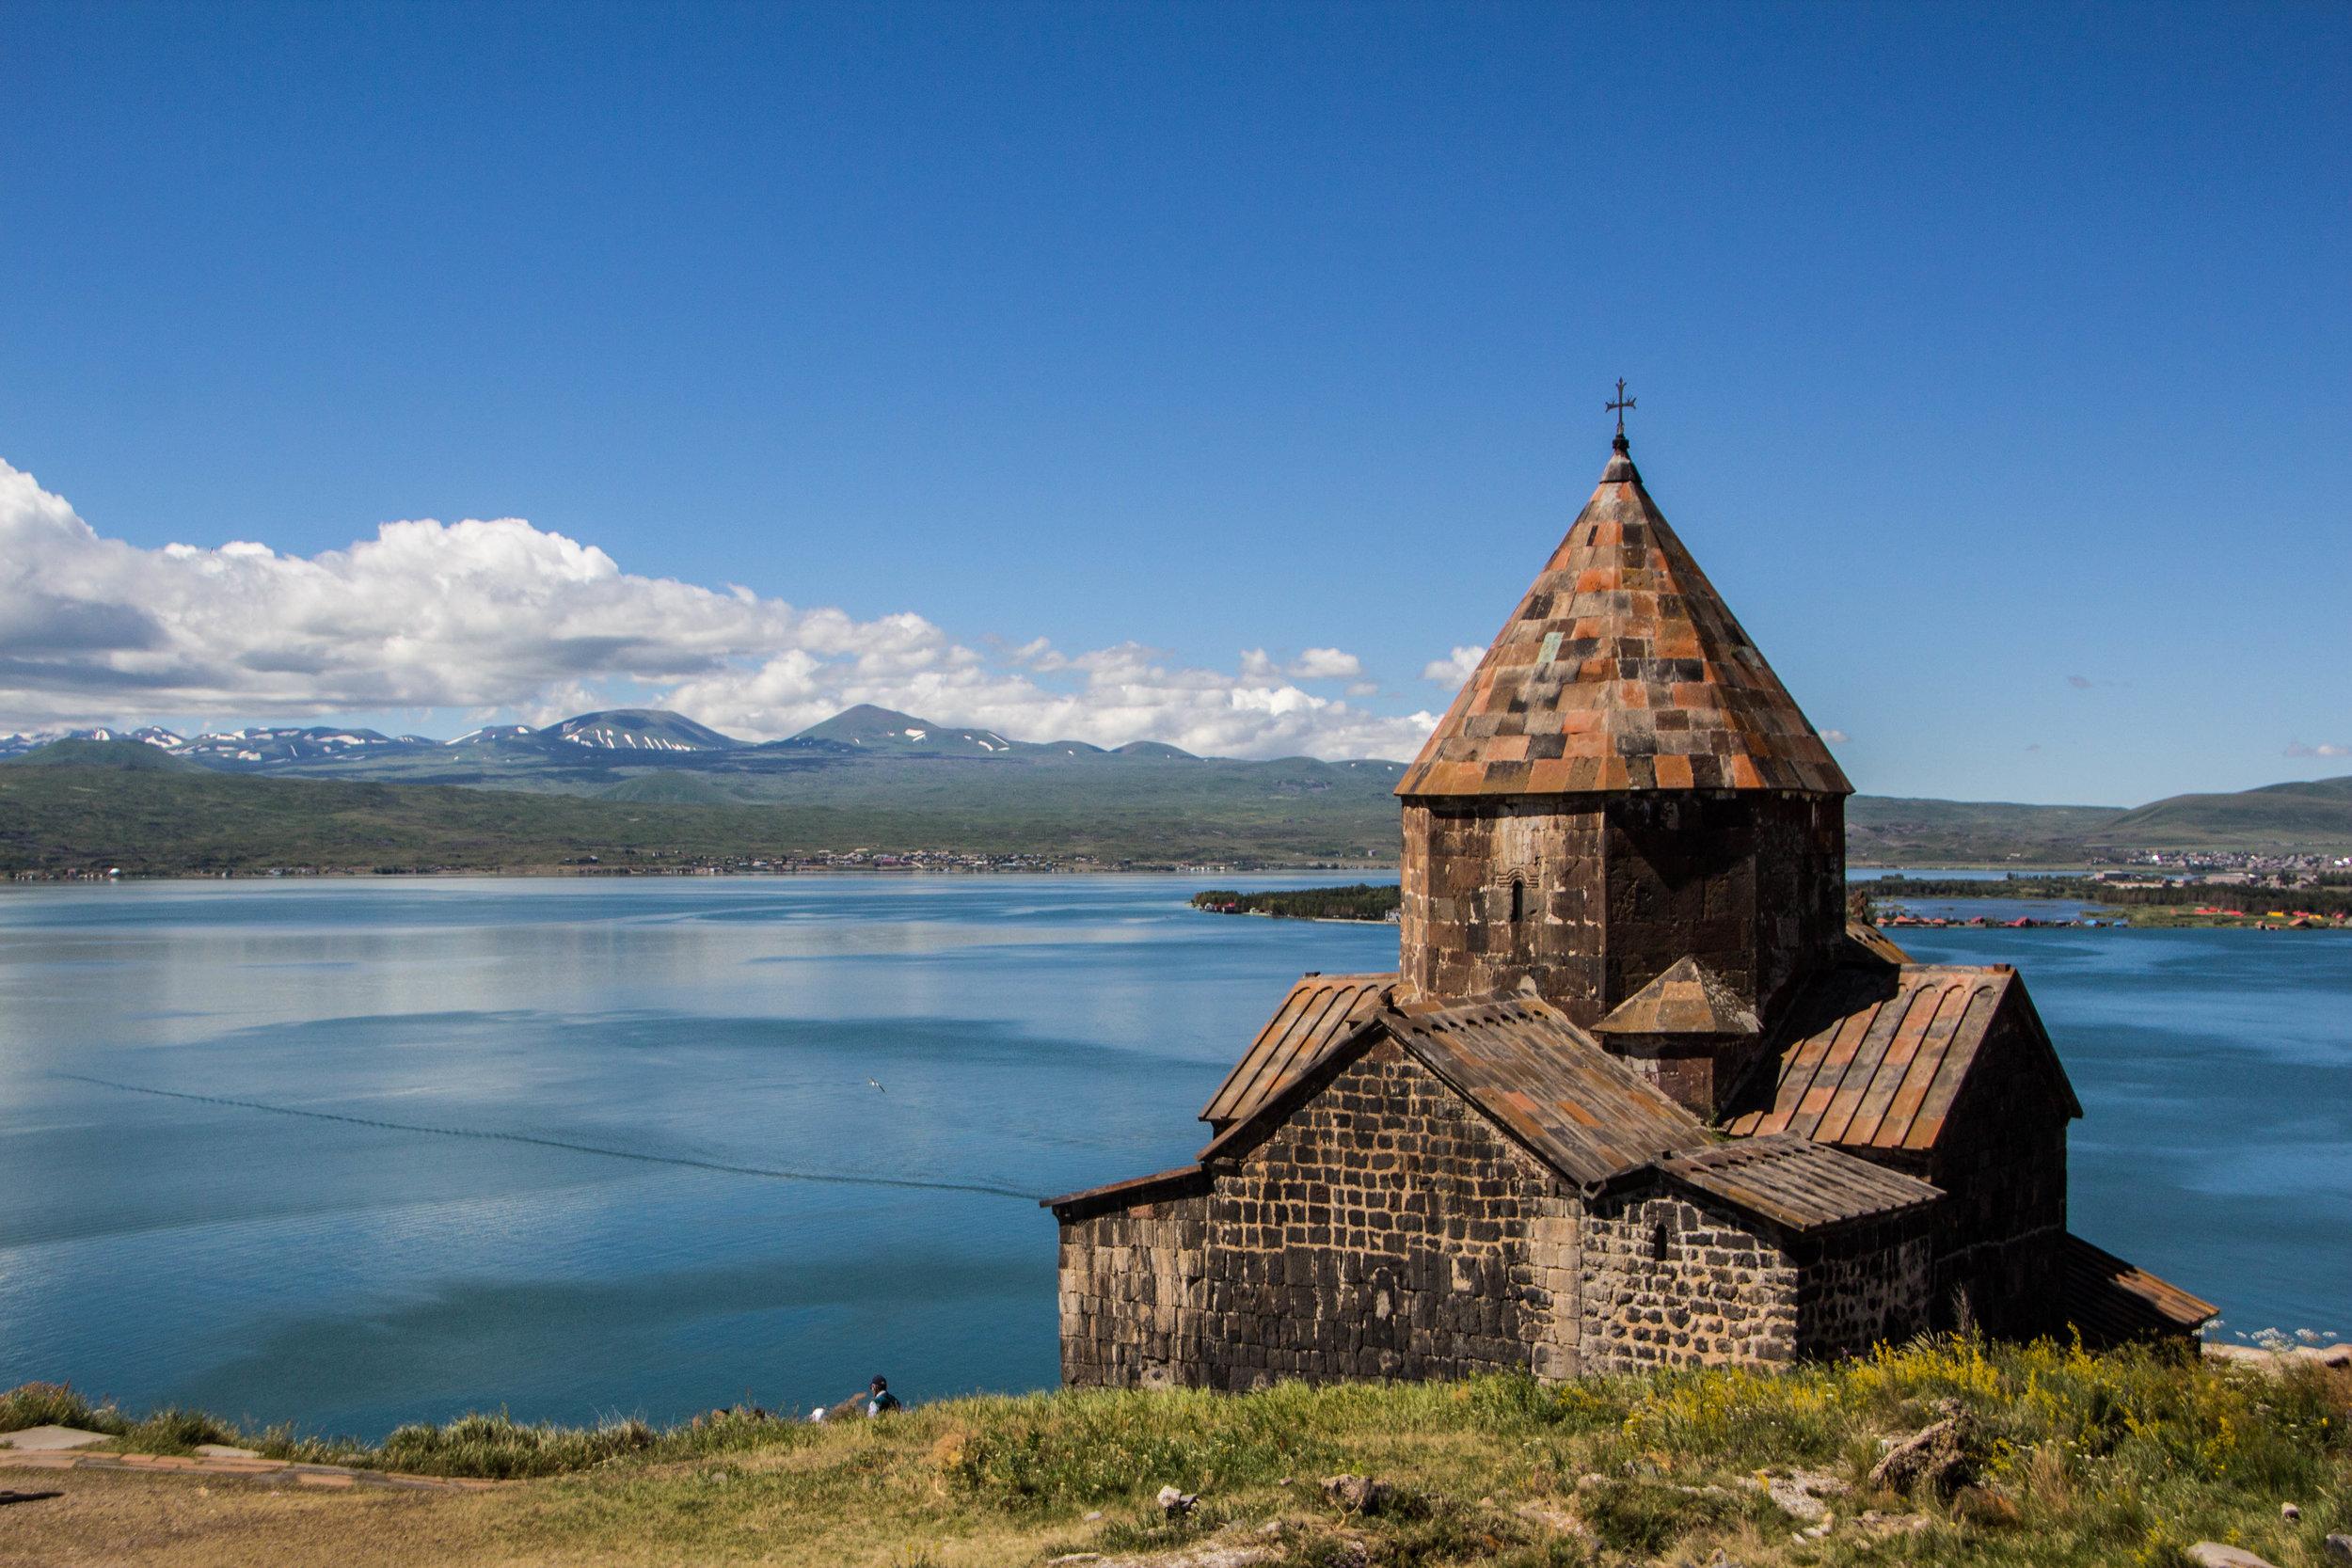 sevanavank-lake-sevan-armenia-19.jpg